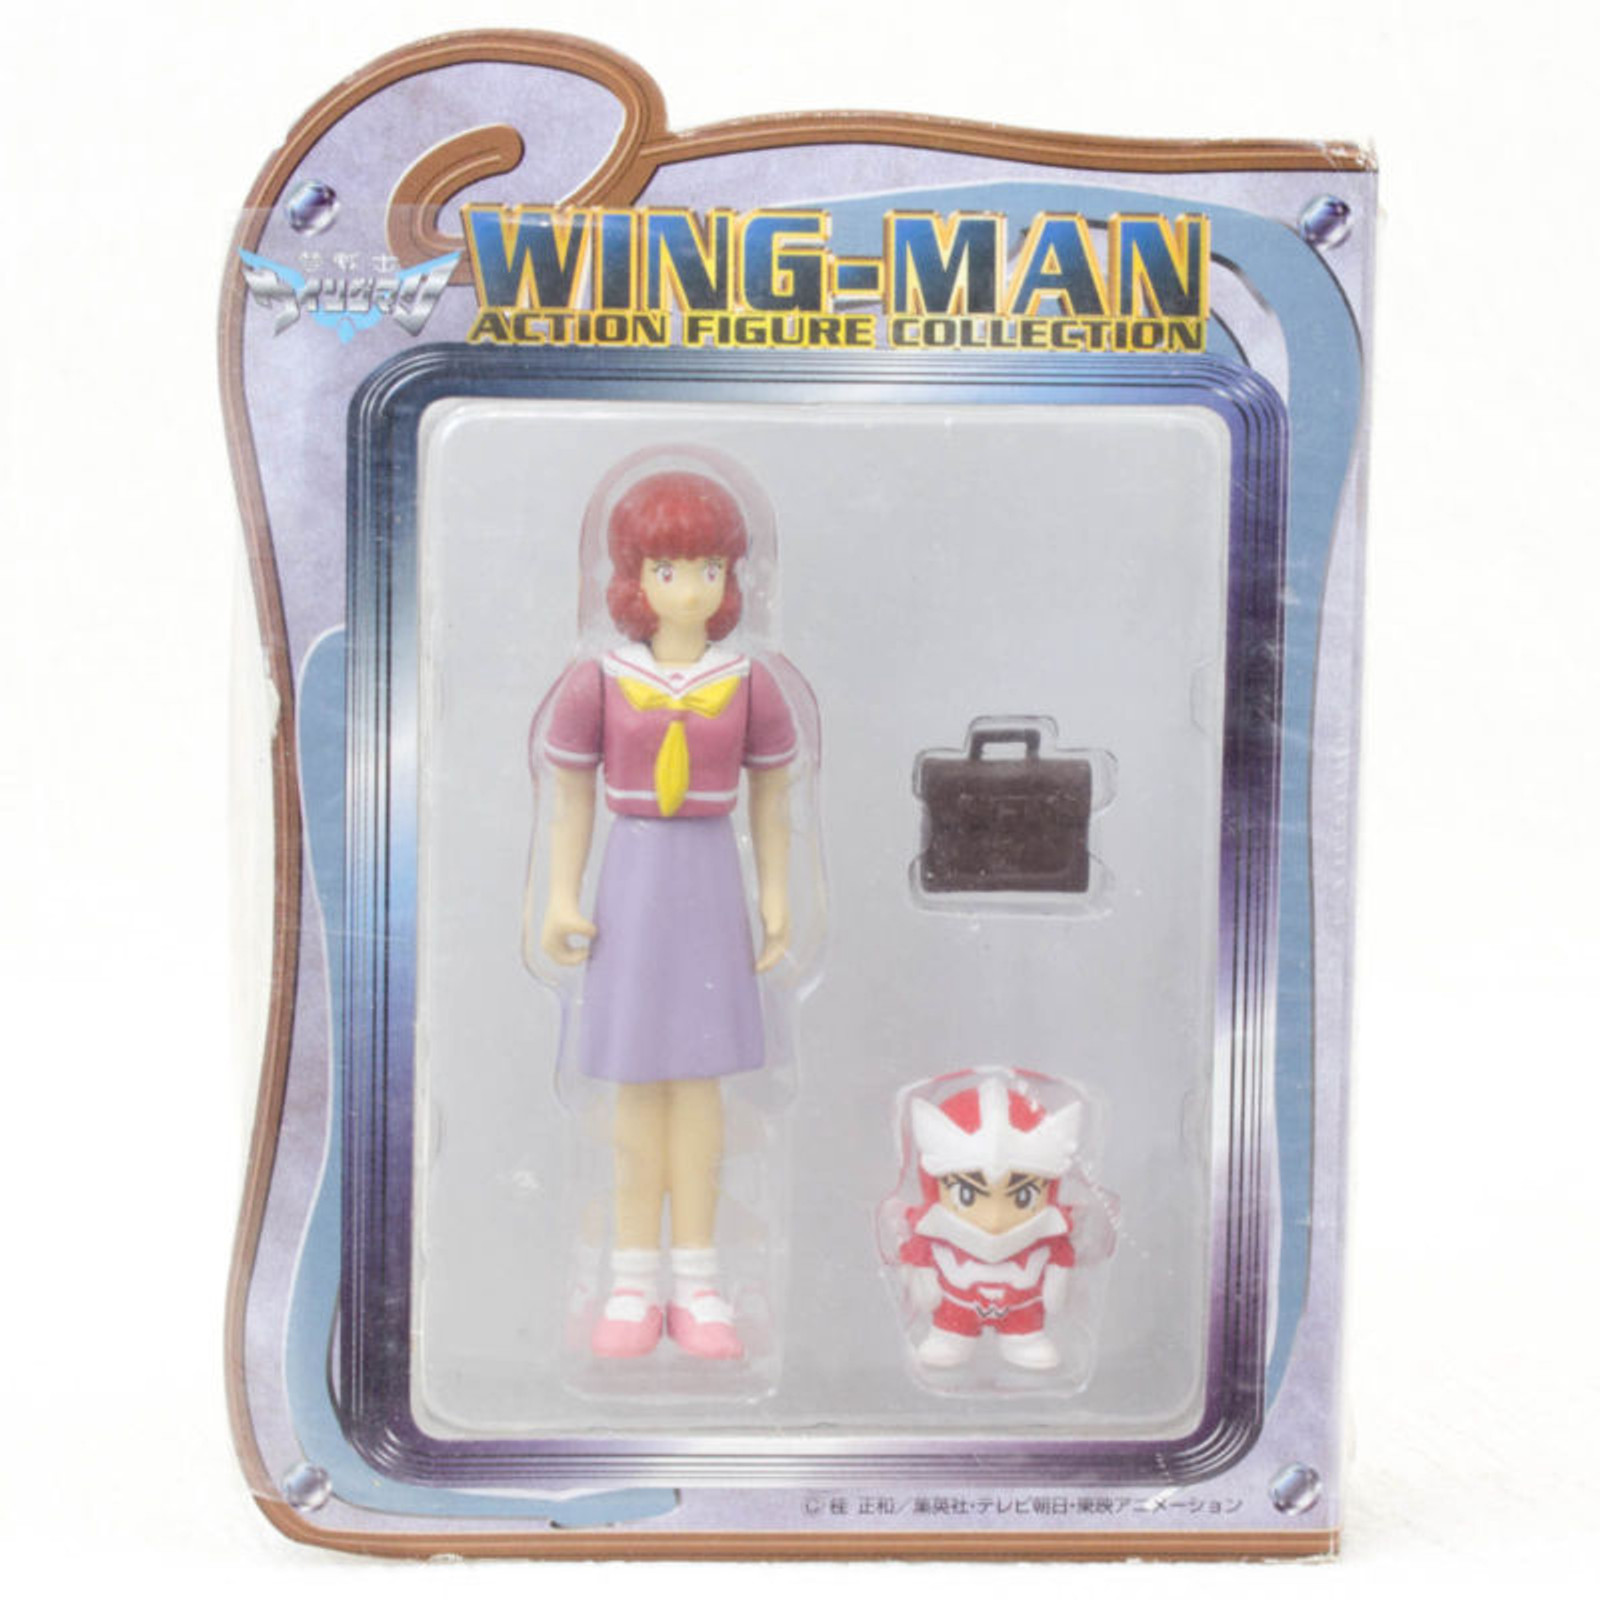 WINGMAN Miku Ogawa Action Figure Collection Banpresto JAPAN ANIME MANGA